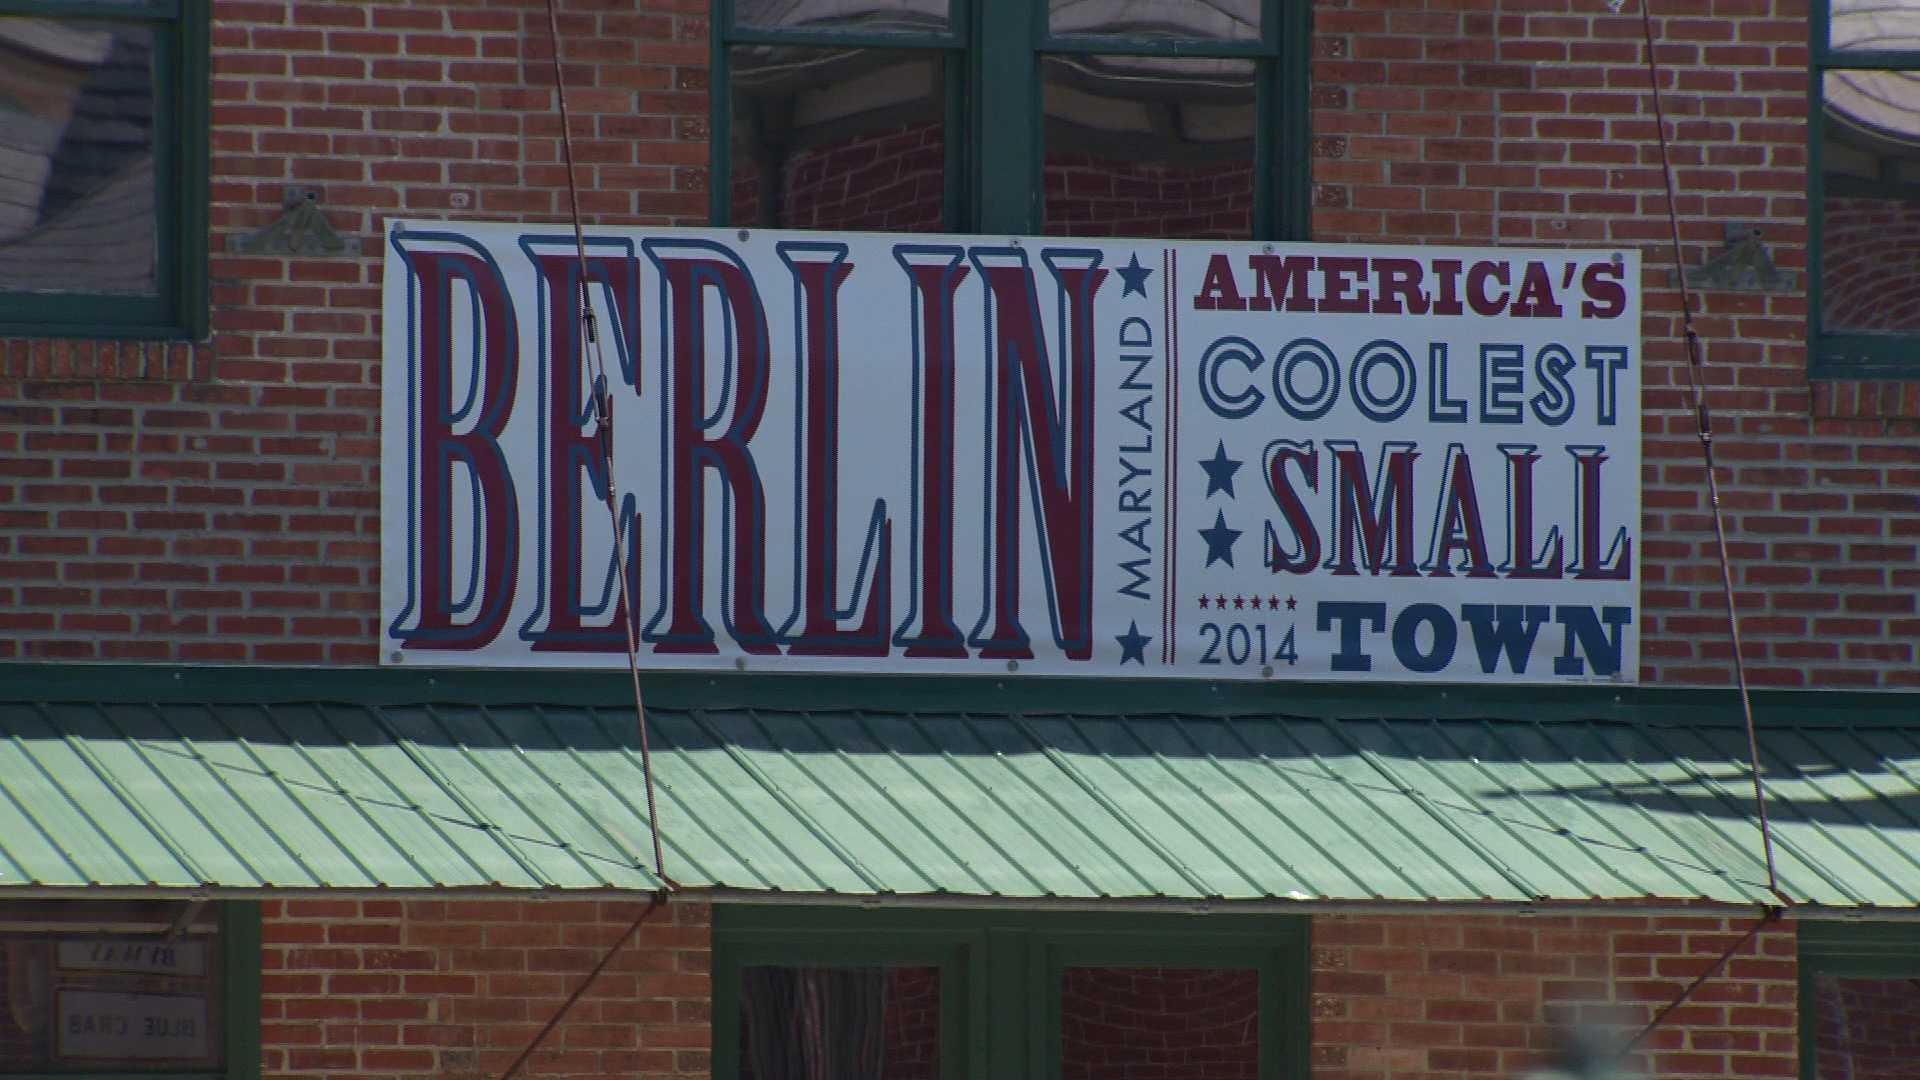 Berlin, Maryland